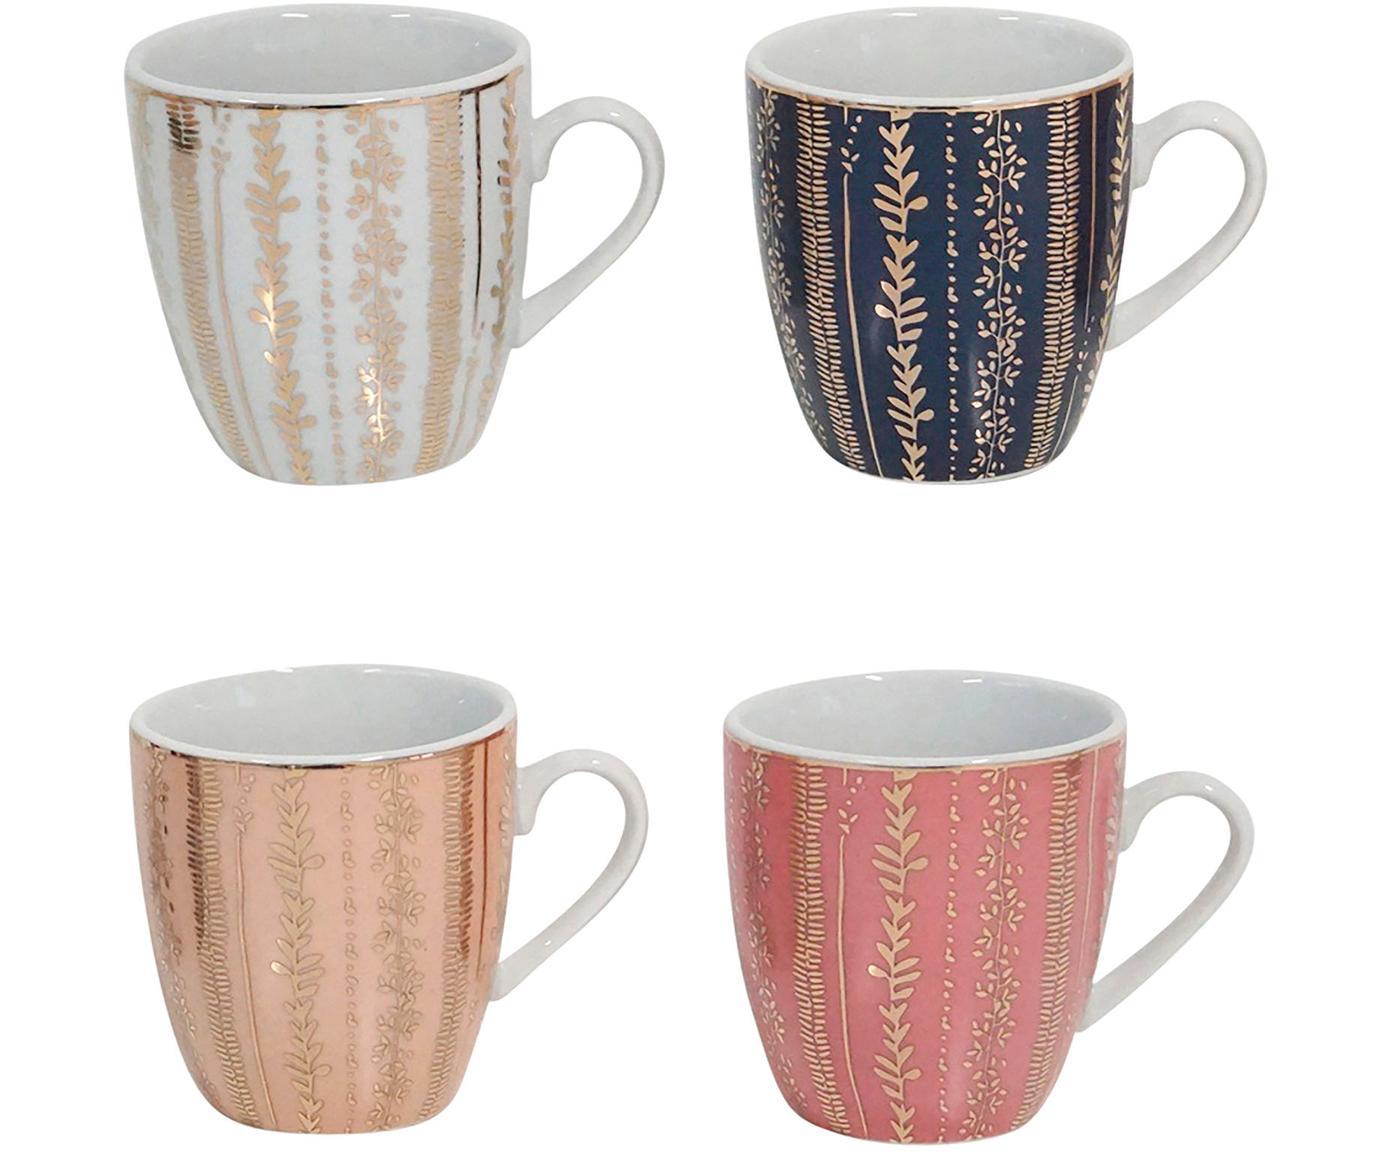 Koffiekopjesset Veg-Gold, 4 stuks, Porselein, Roze, blauw, Ø 7 cm